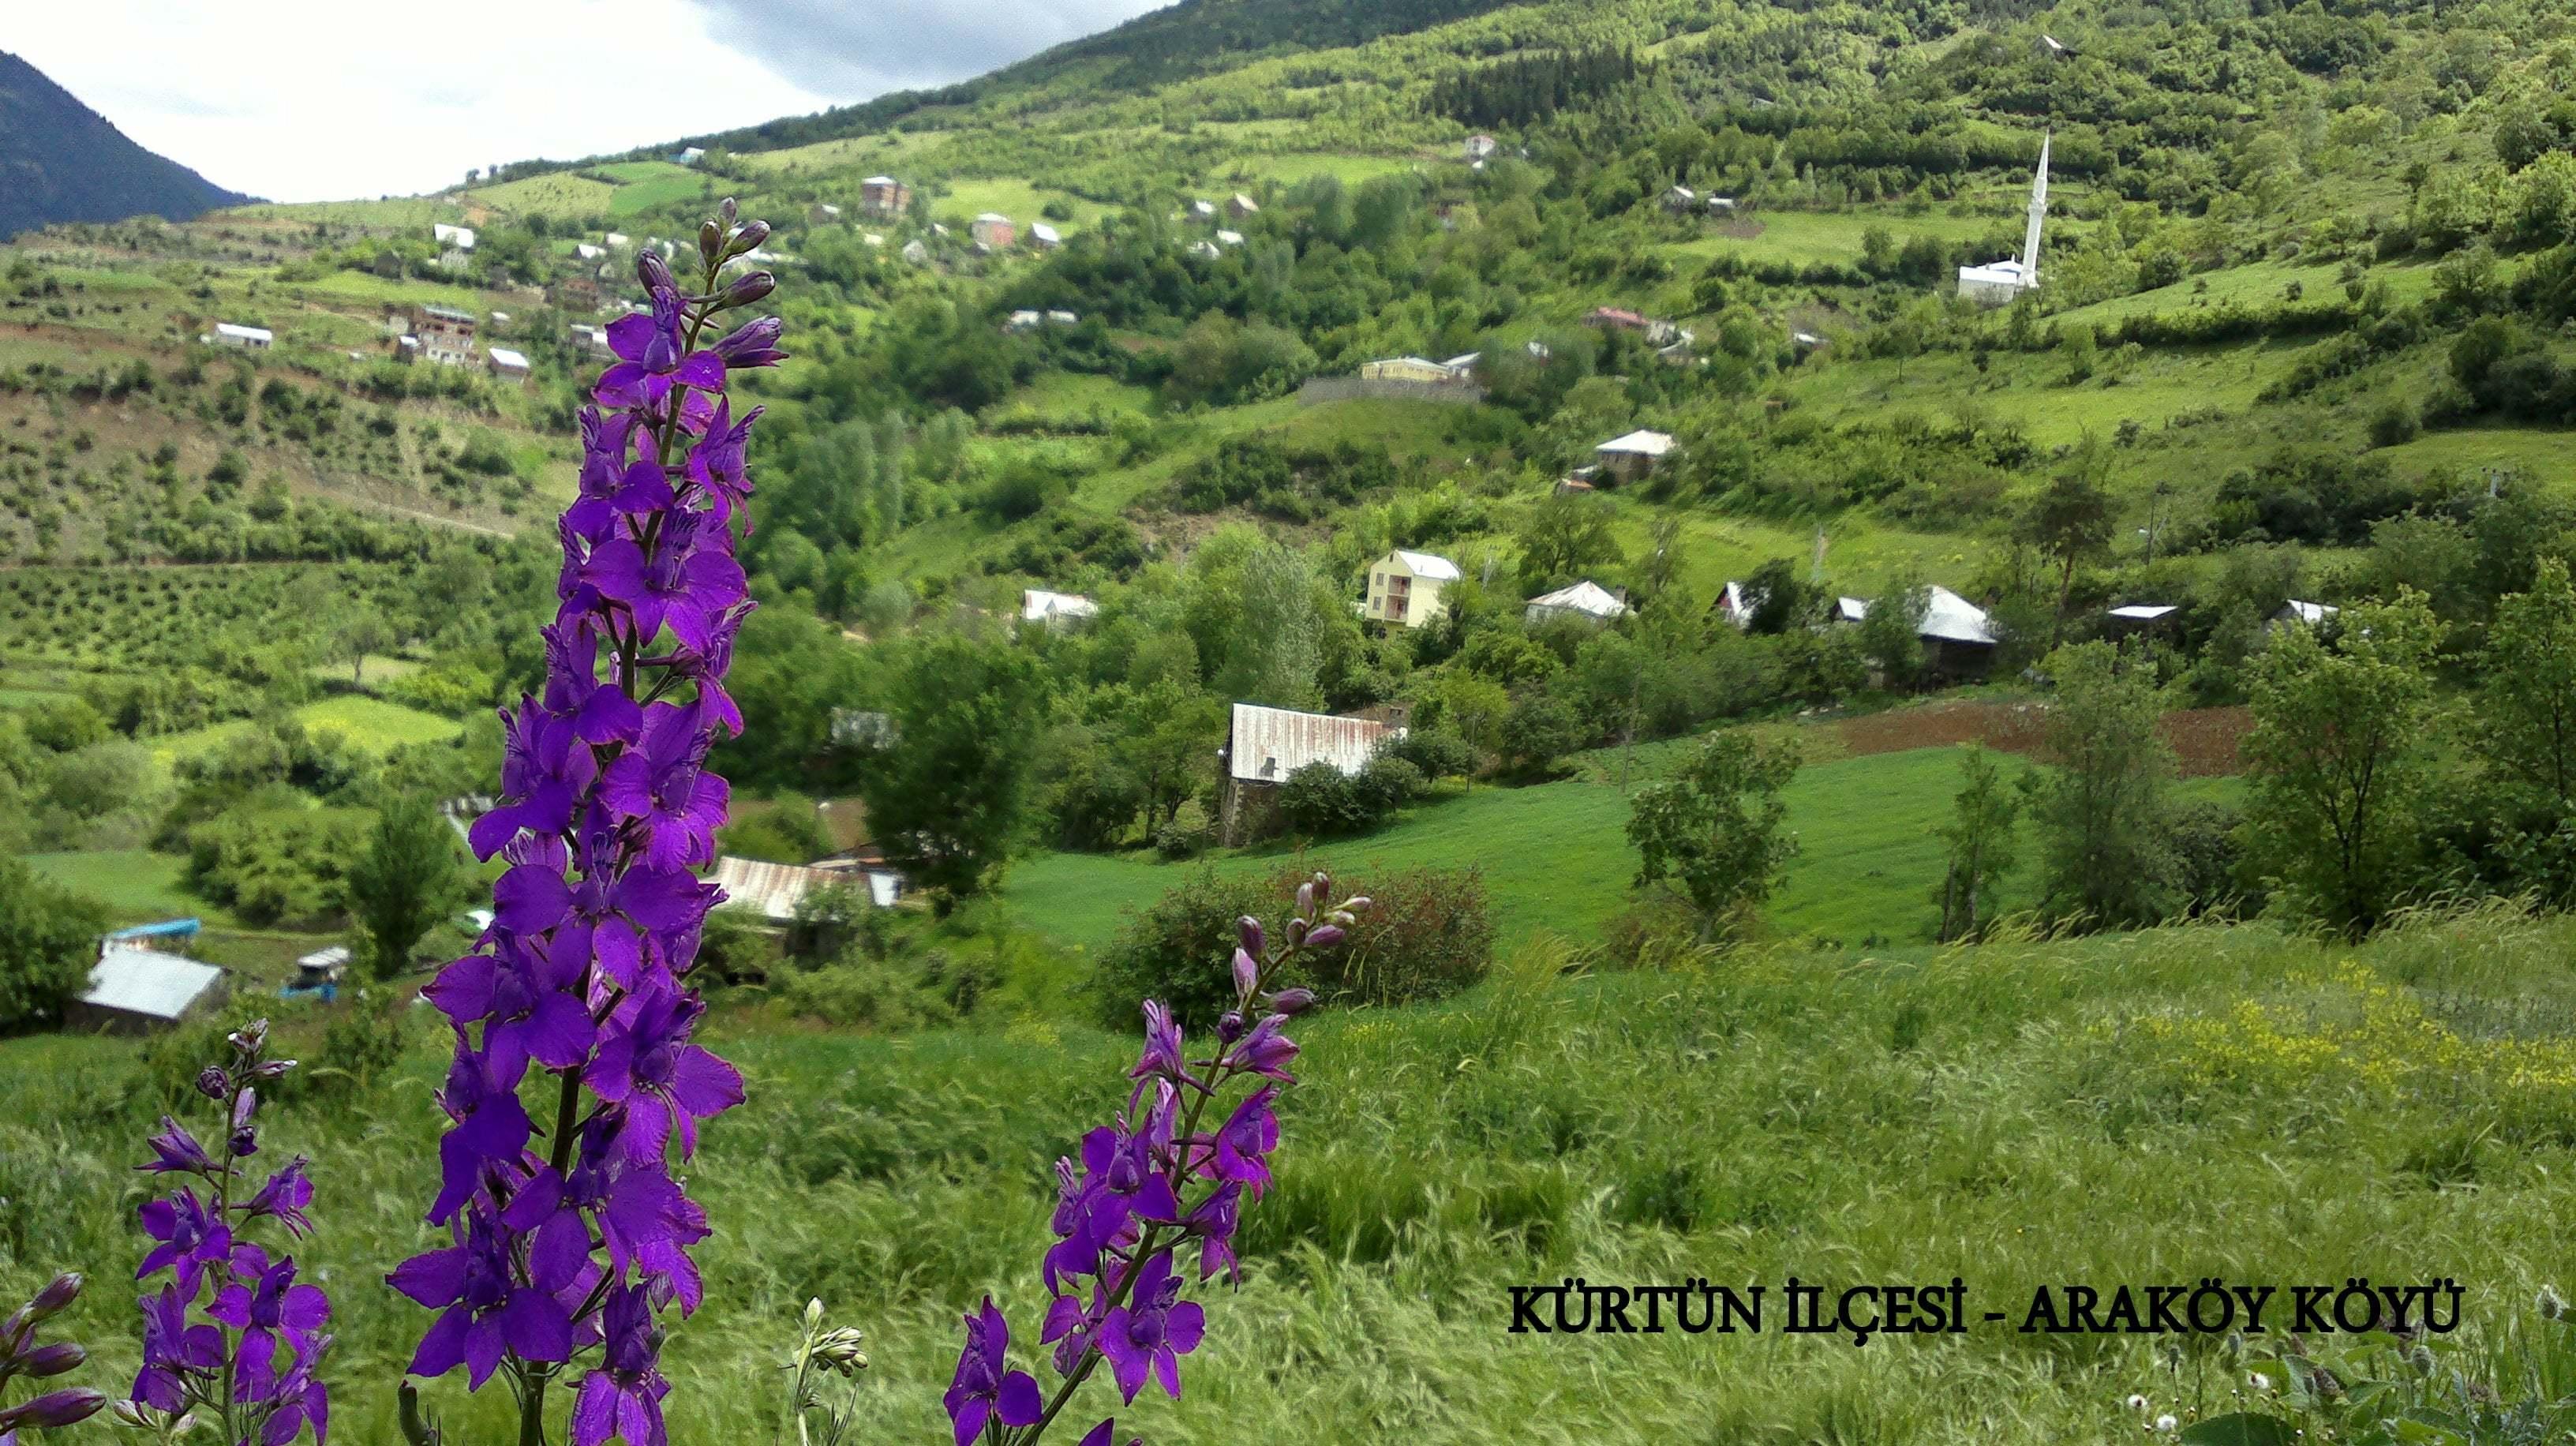 Kürtün İlçesi – Araköy Köyü